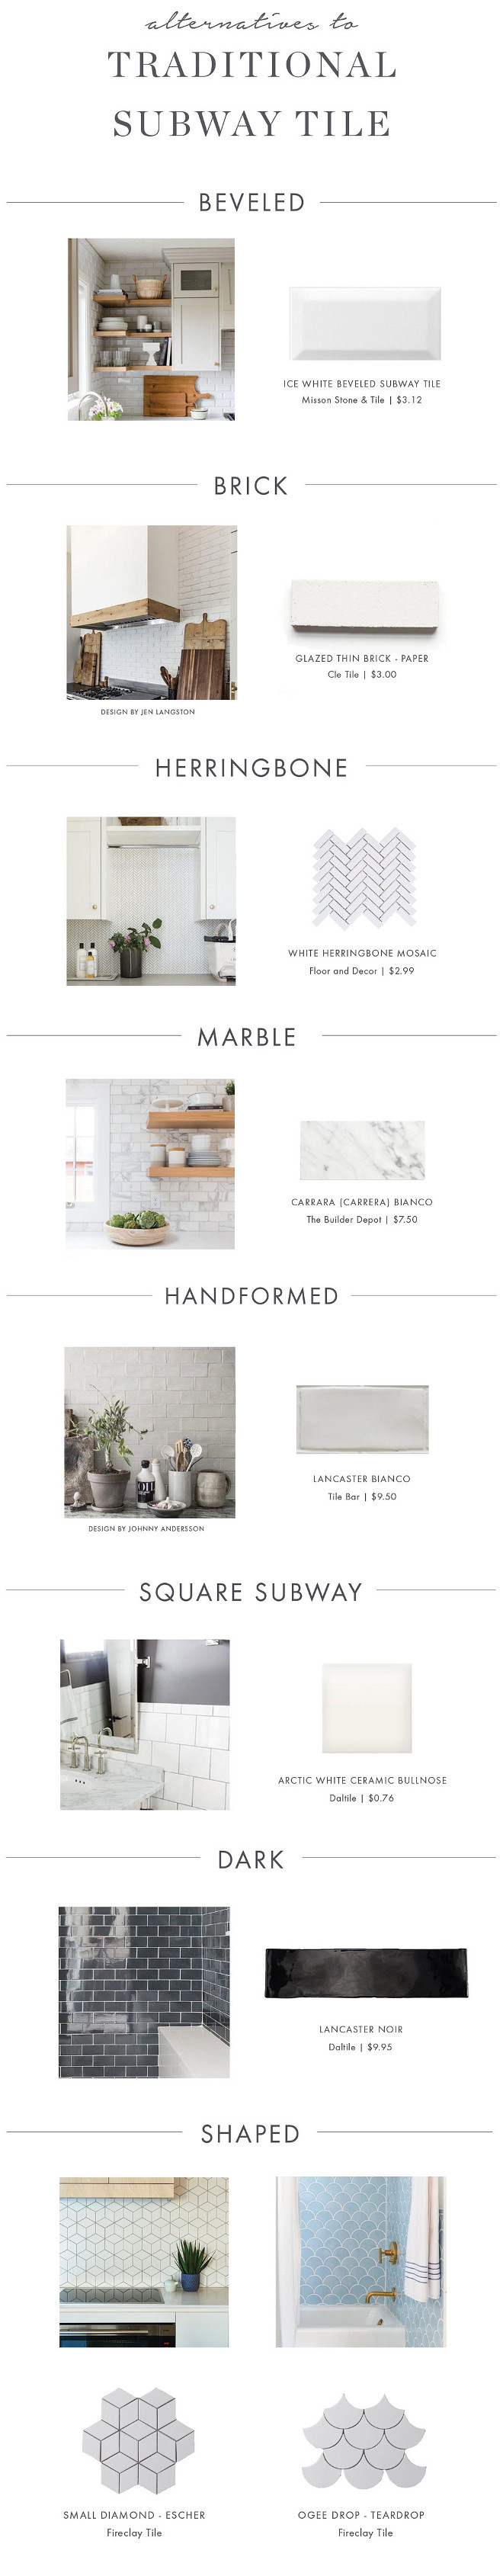 Tile Ideas Backsplash Tile Shower Tile Latest Tiles Beveled Tile, Brick, Herringbone Tile, Marble Tile, Handformed Tile, Square Subway Tile, Dark Tile, Shaped Tile #tiles